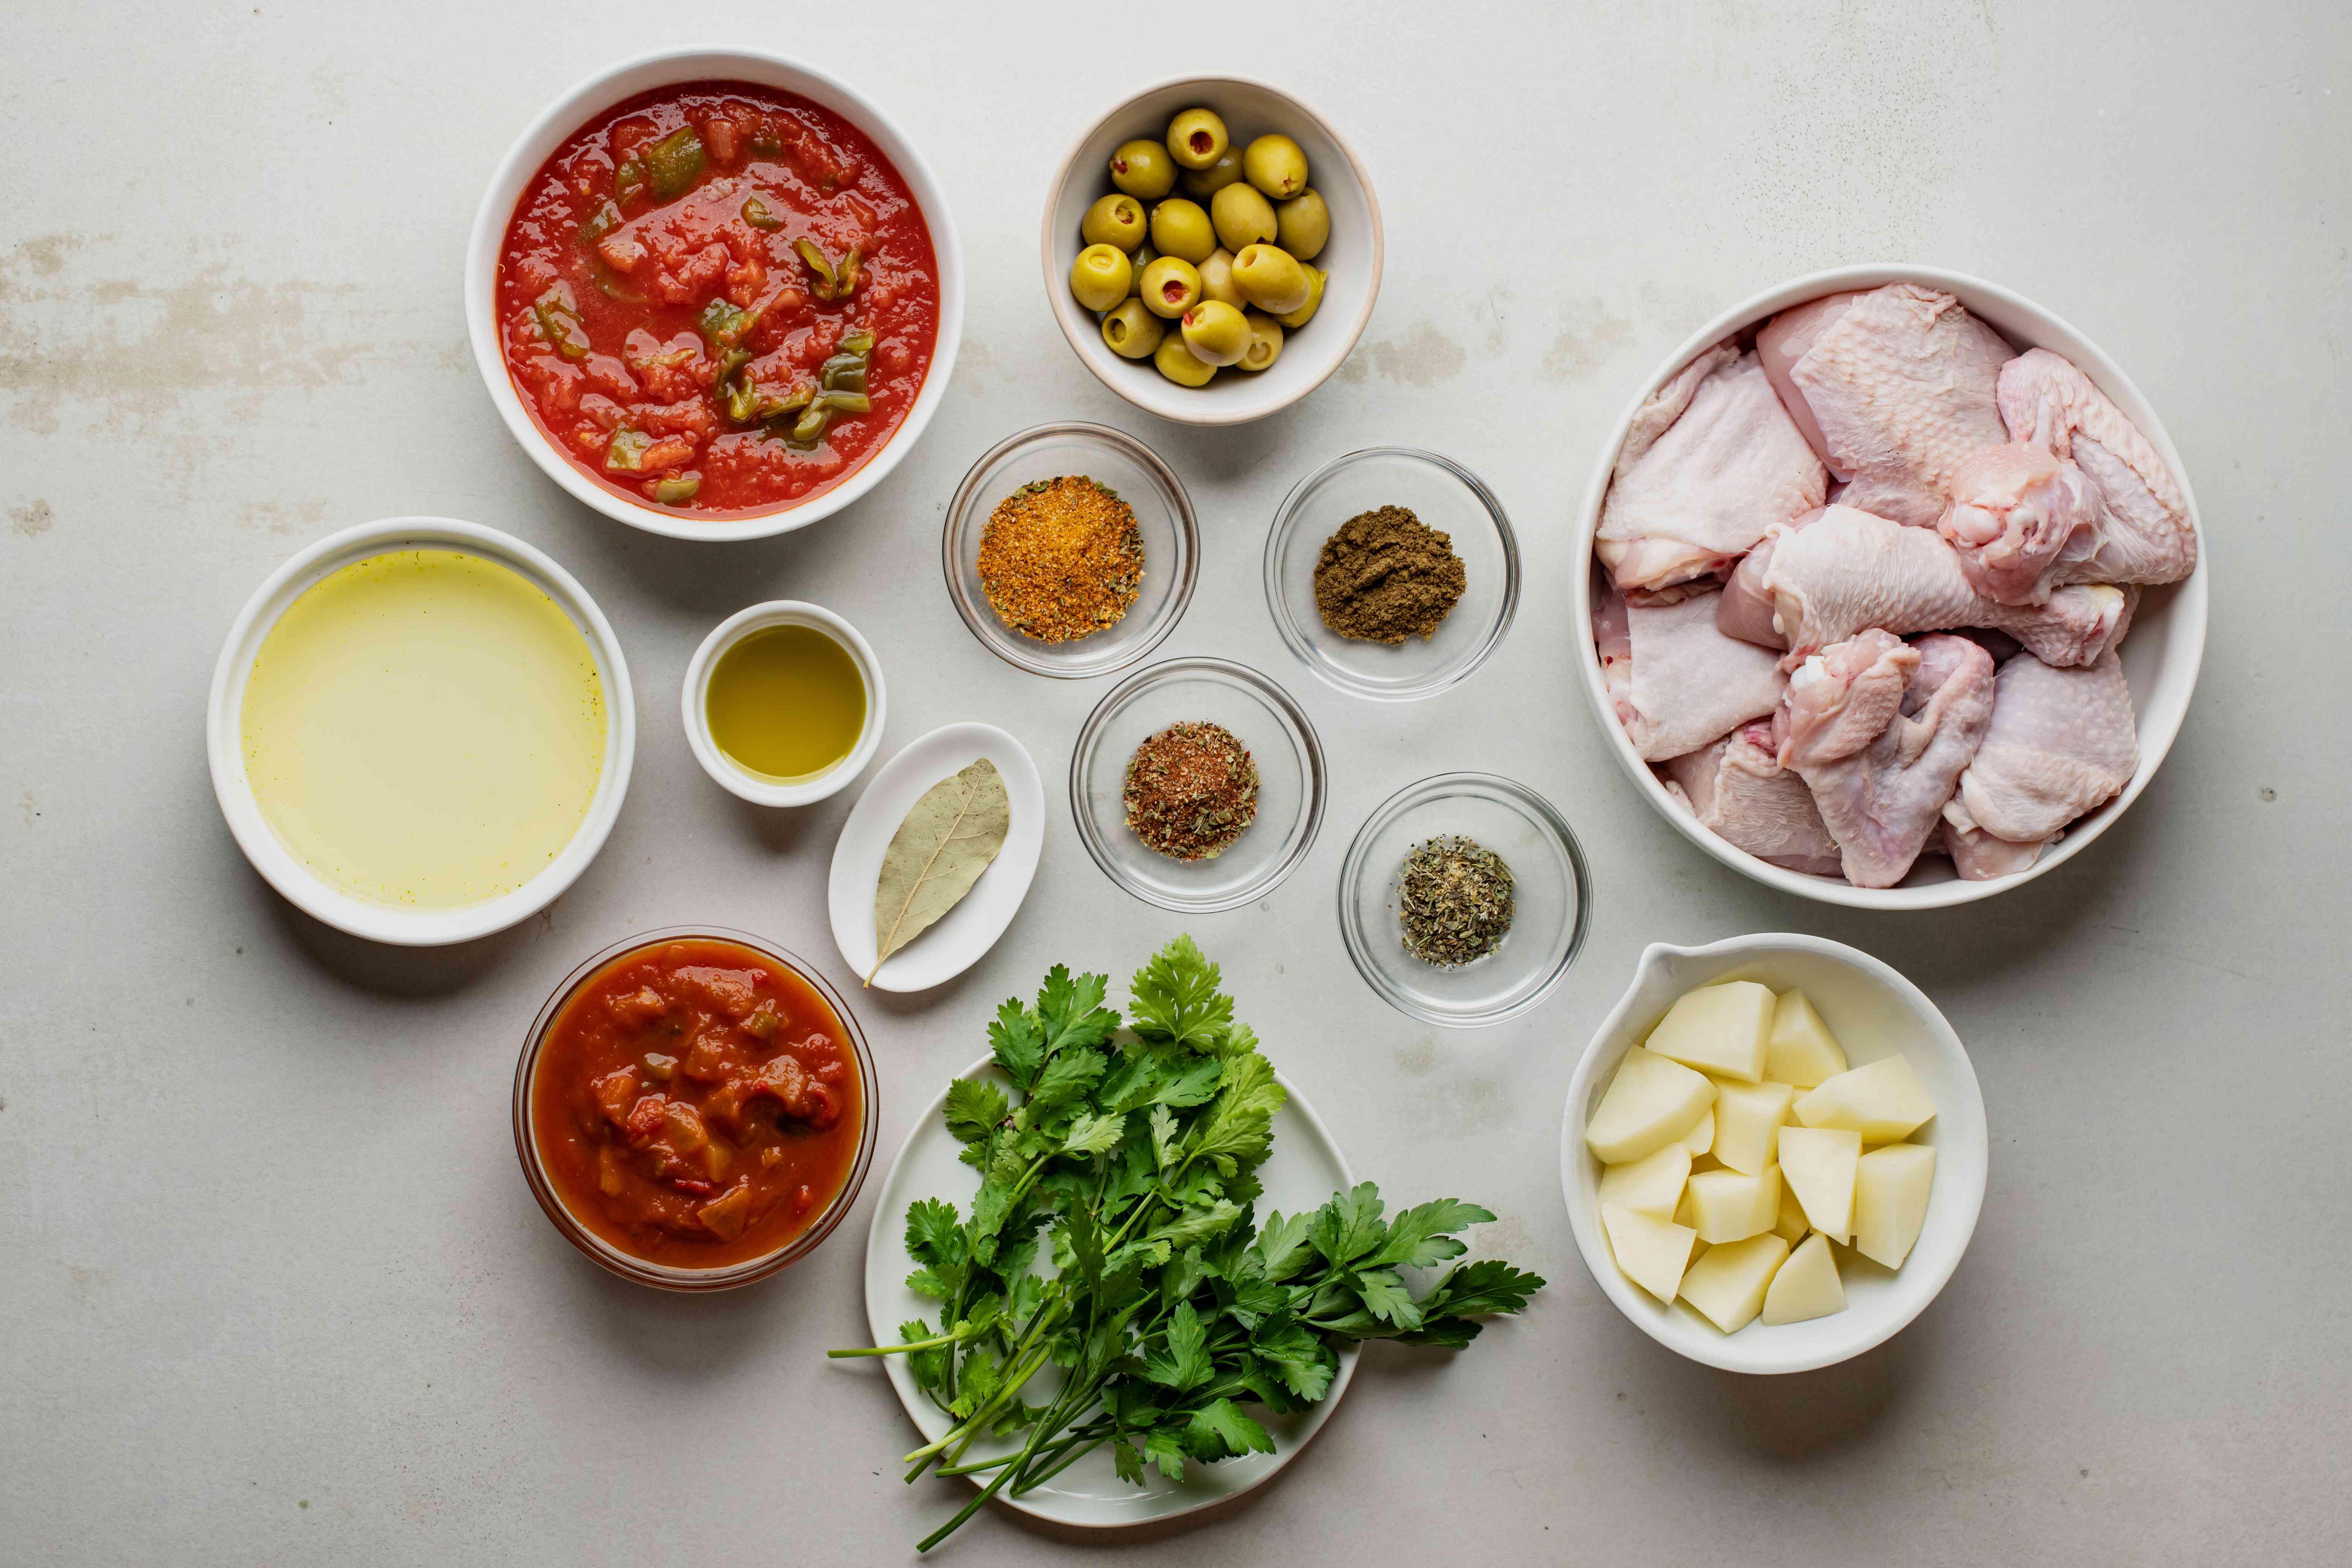 Ingredients for pollo guisado